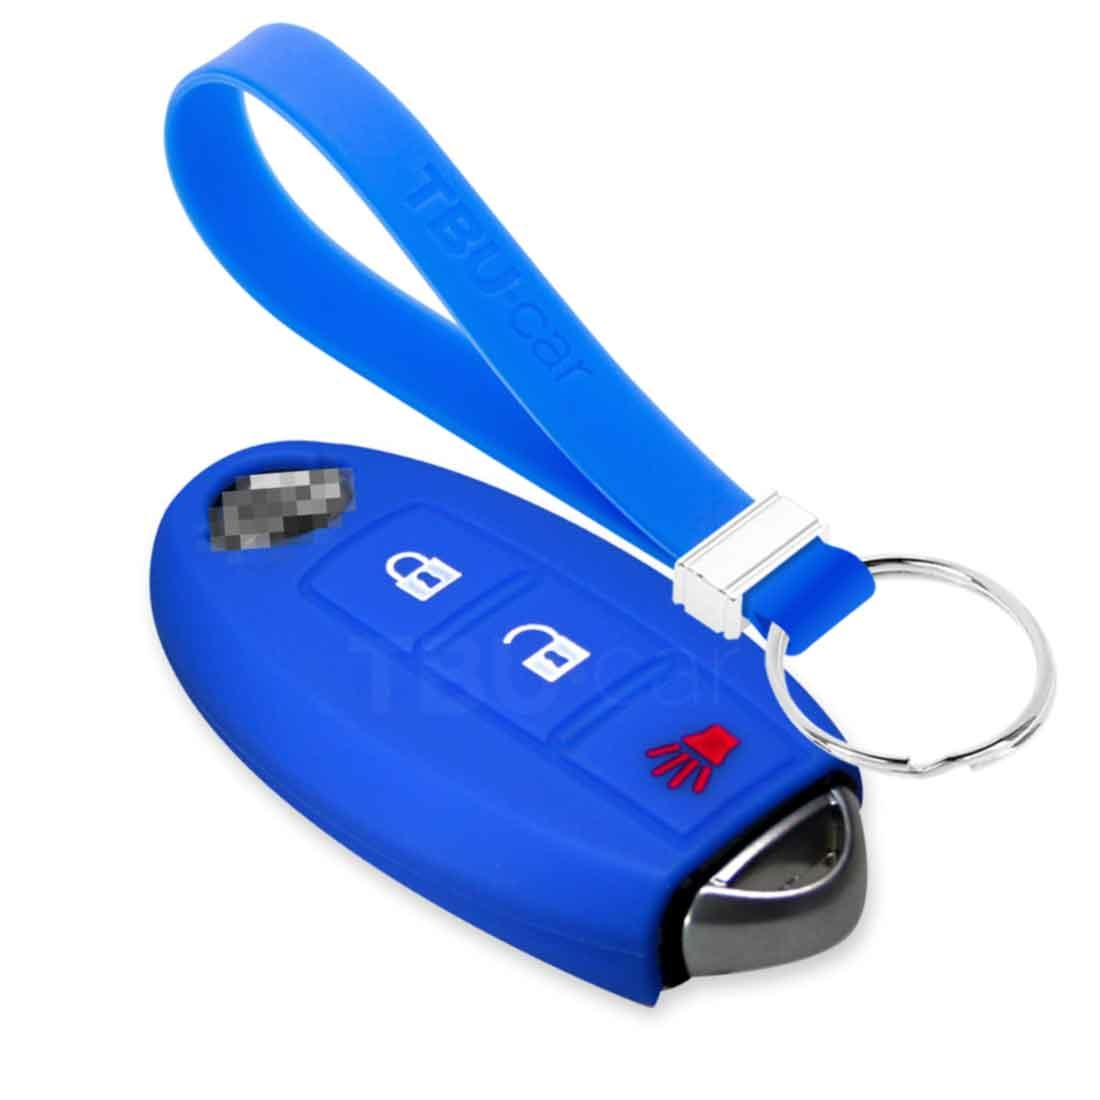 TBU car TBU car Autoschlüssel Hülle kompatibel mit Nissan 3 Tasten (Keyless Entry) - Schutzhülle aus Silikon - Auto Schlüsselhülle Cover in Blau